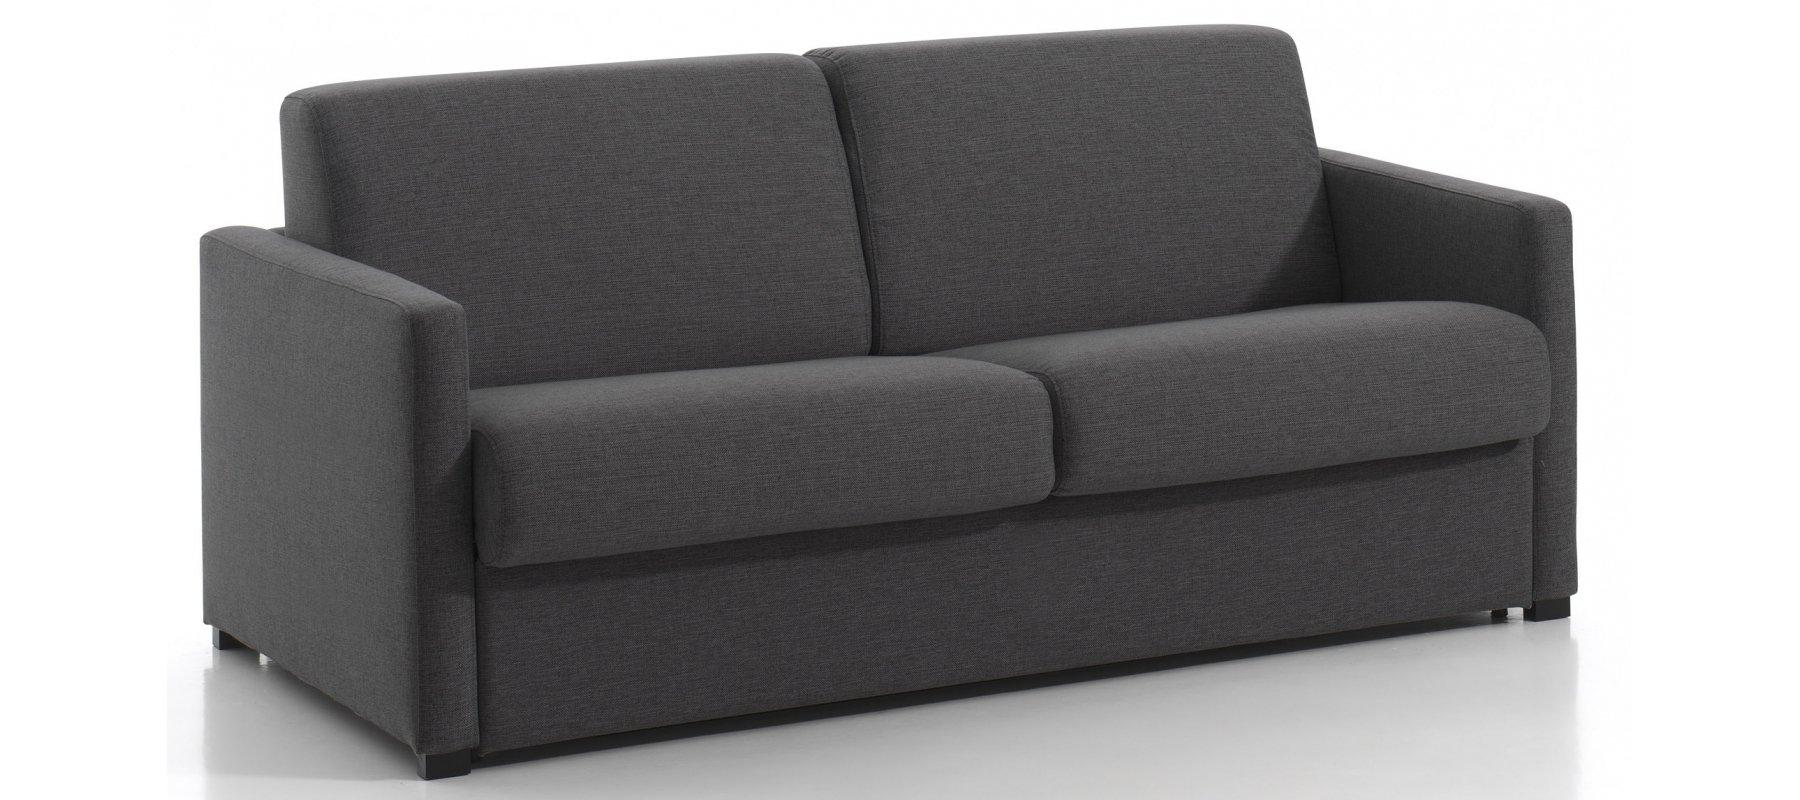 canap convertible pas cher rapido metz couchage confortable 120 cm. Black Bedroom Furniture Sets. Home Design Ideas